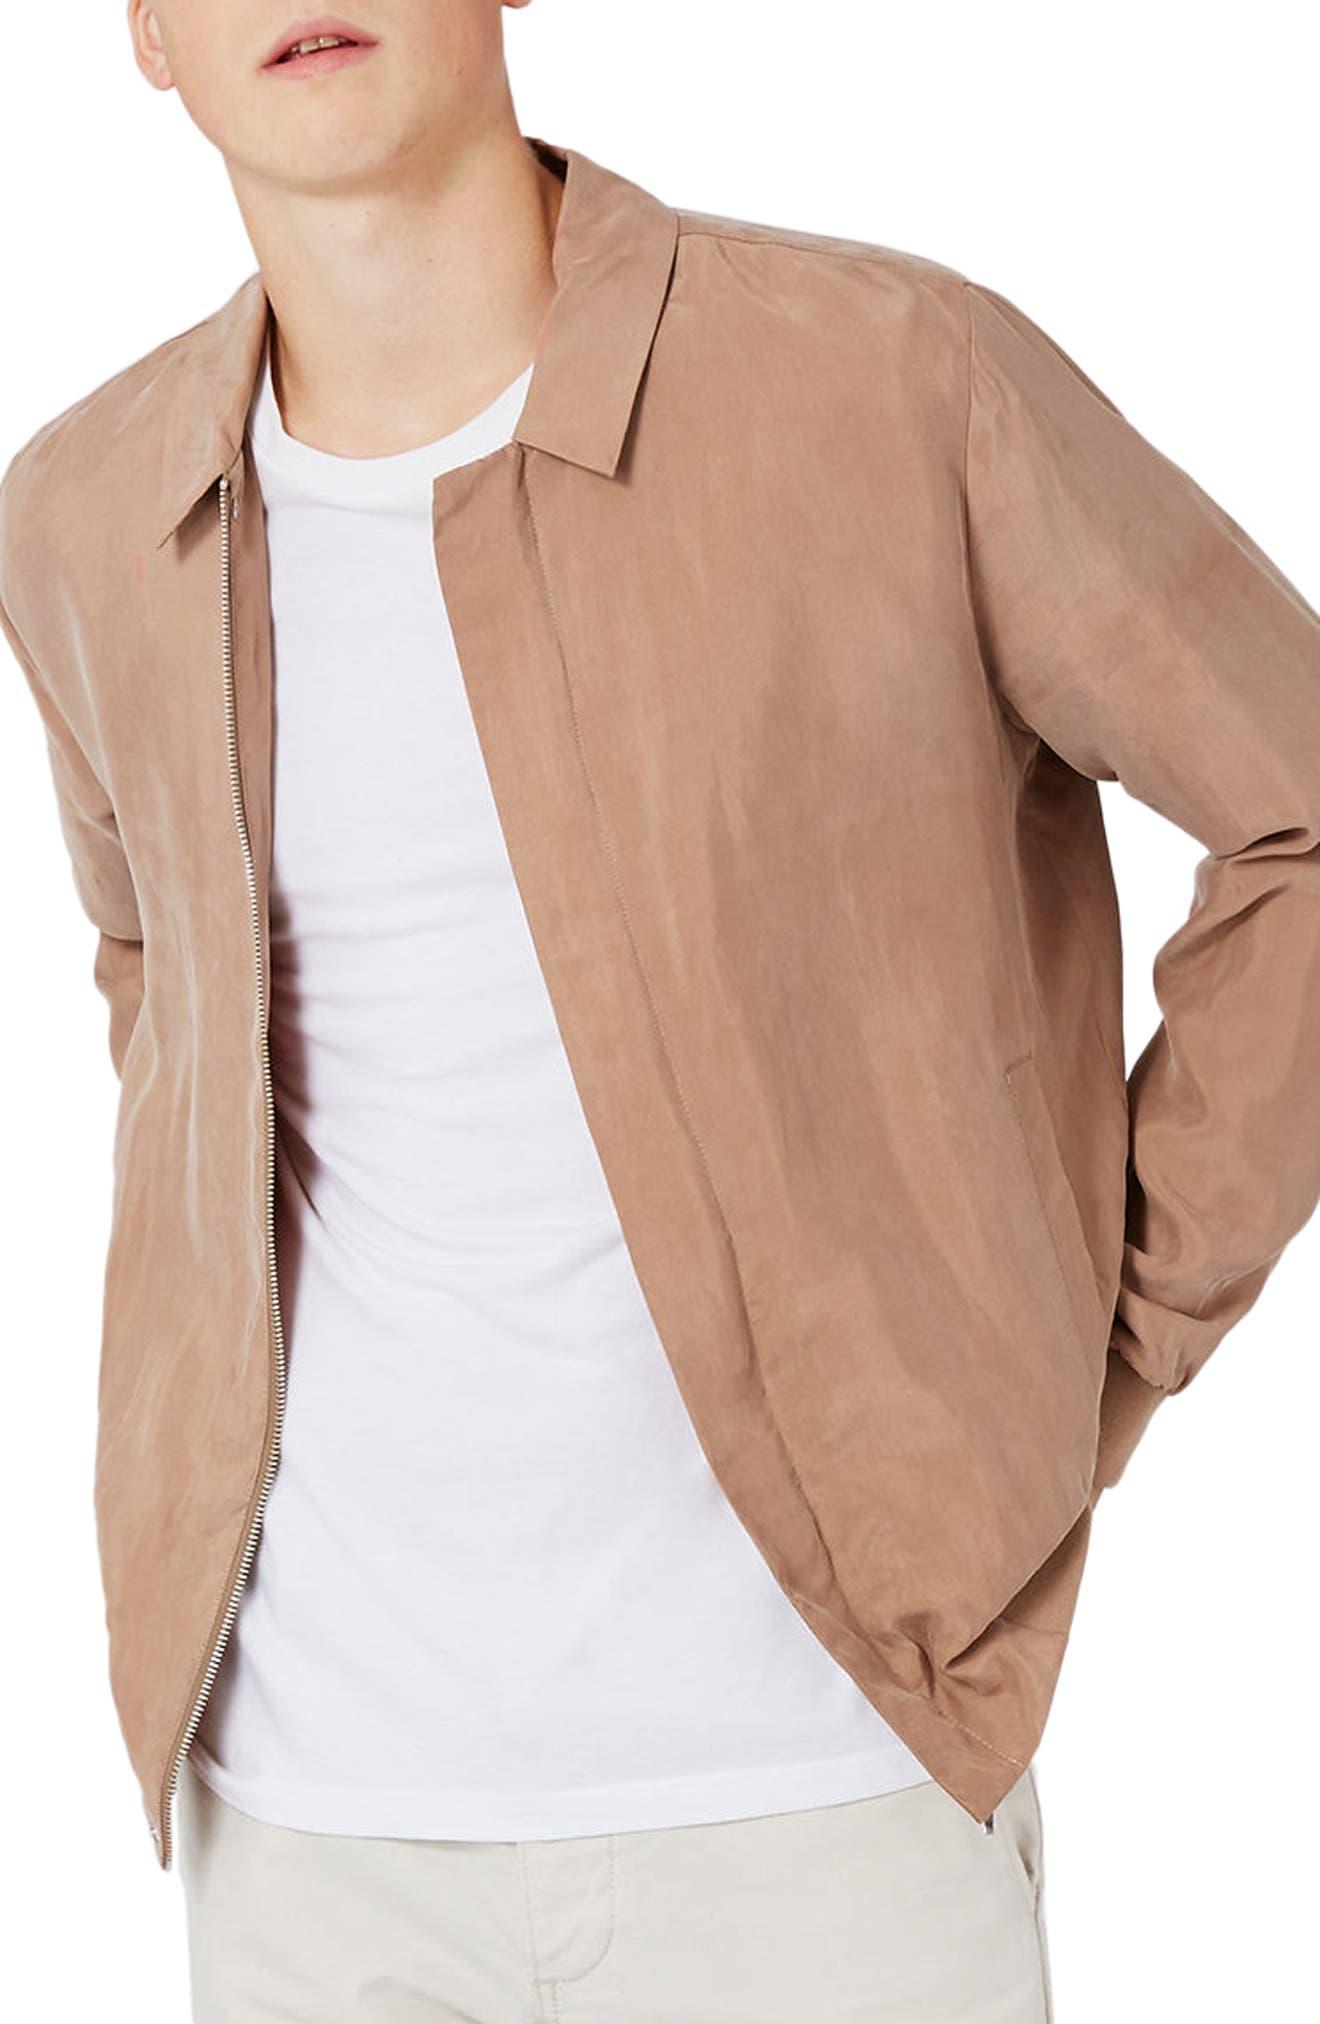 Topman Coach's Bomber Jacket